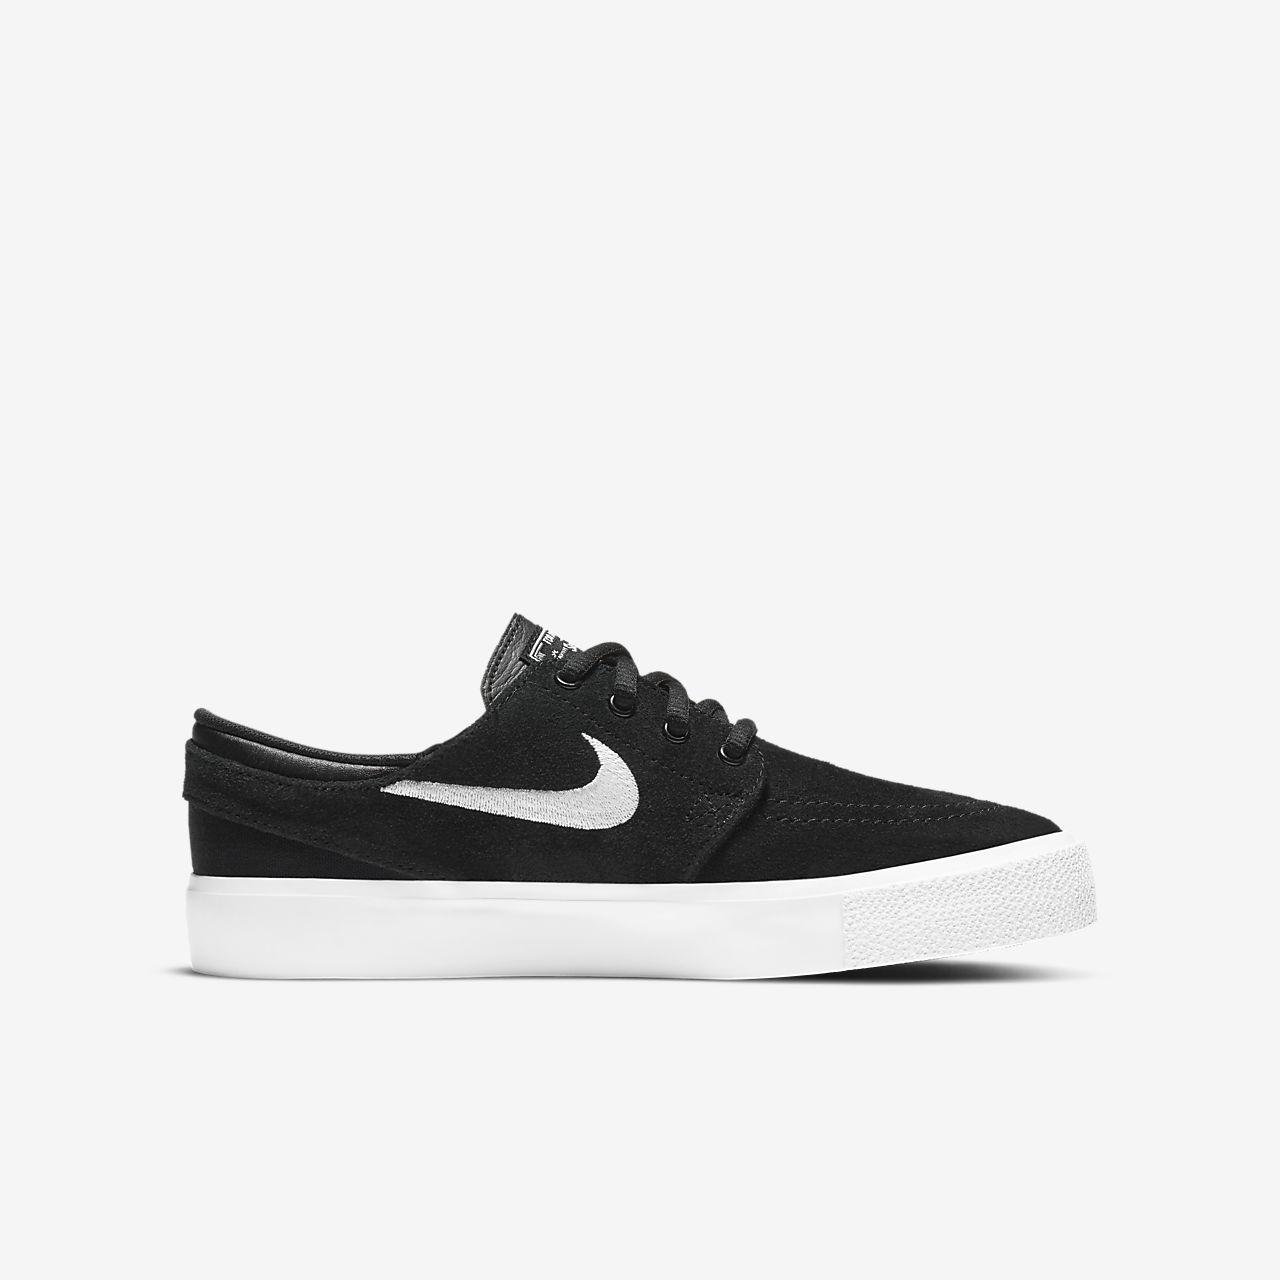 reputable site d85fc dbb5b ... Nike Zoom Stefan Janoski Zapatillas de skateboard - Niñoa